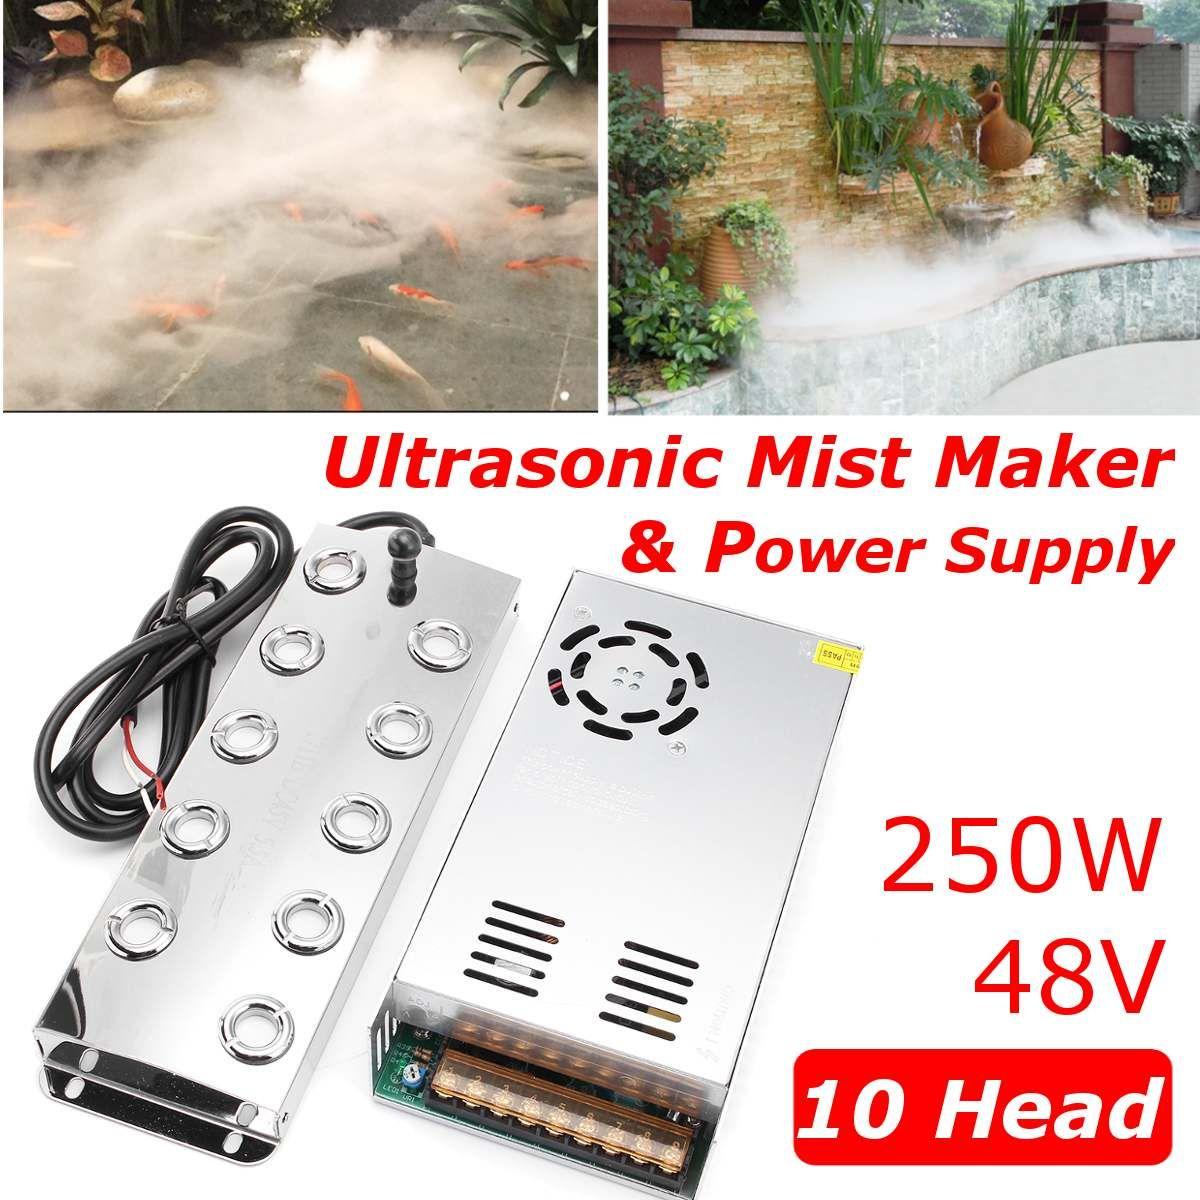 Neueste 5000 ML/H 10 Kopf Ultraschall Nebel Maker Fogger Edelstahl Luftbefeuchter Gewächshaus Aeromist Hydrokultur + Transformator